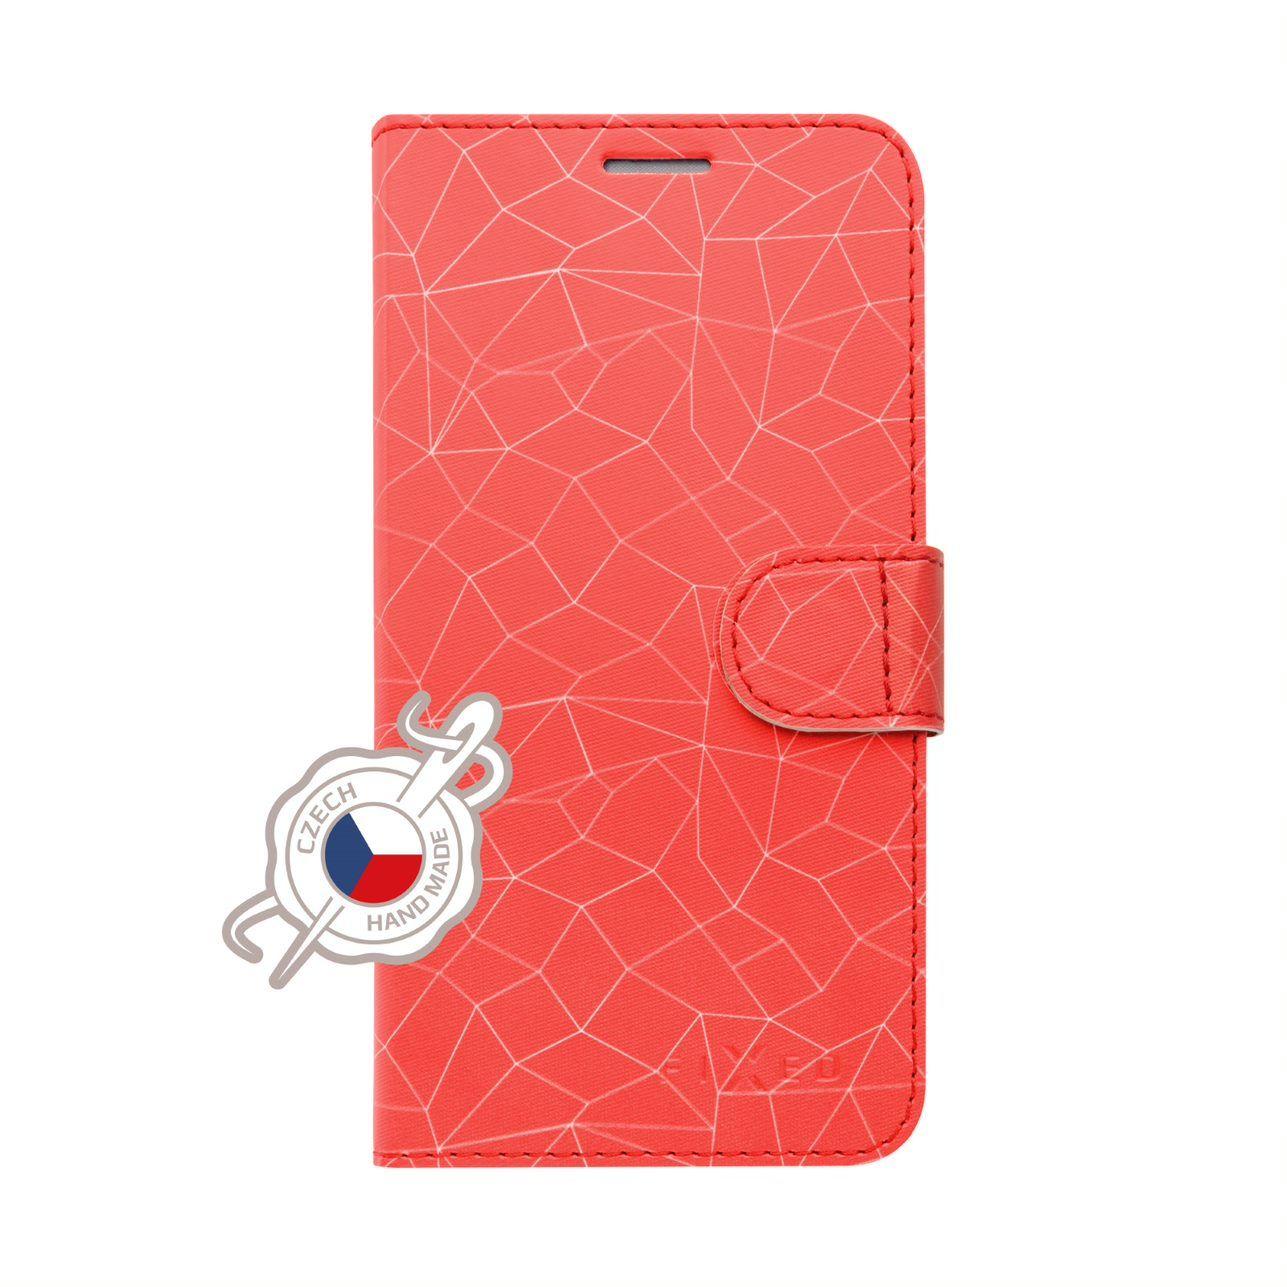 FIXED FIT flipové pouzdro pro Huawei P Smart 2019, motiv Red Mesh